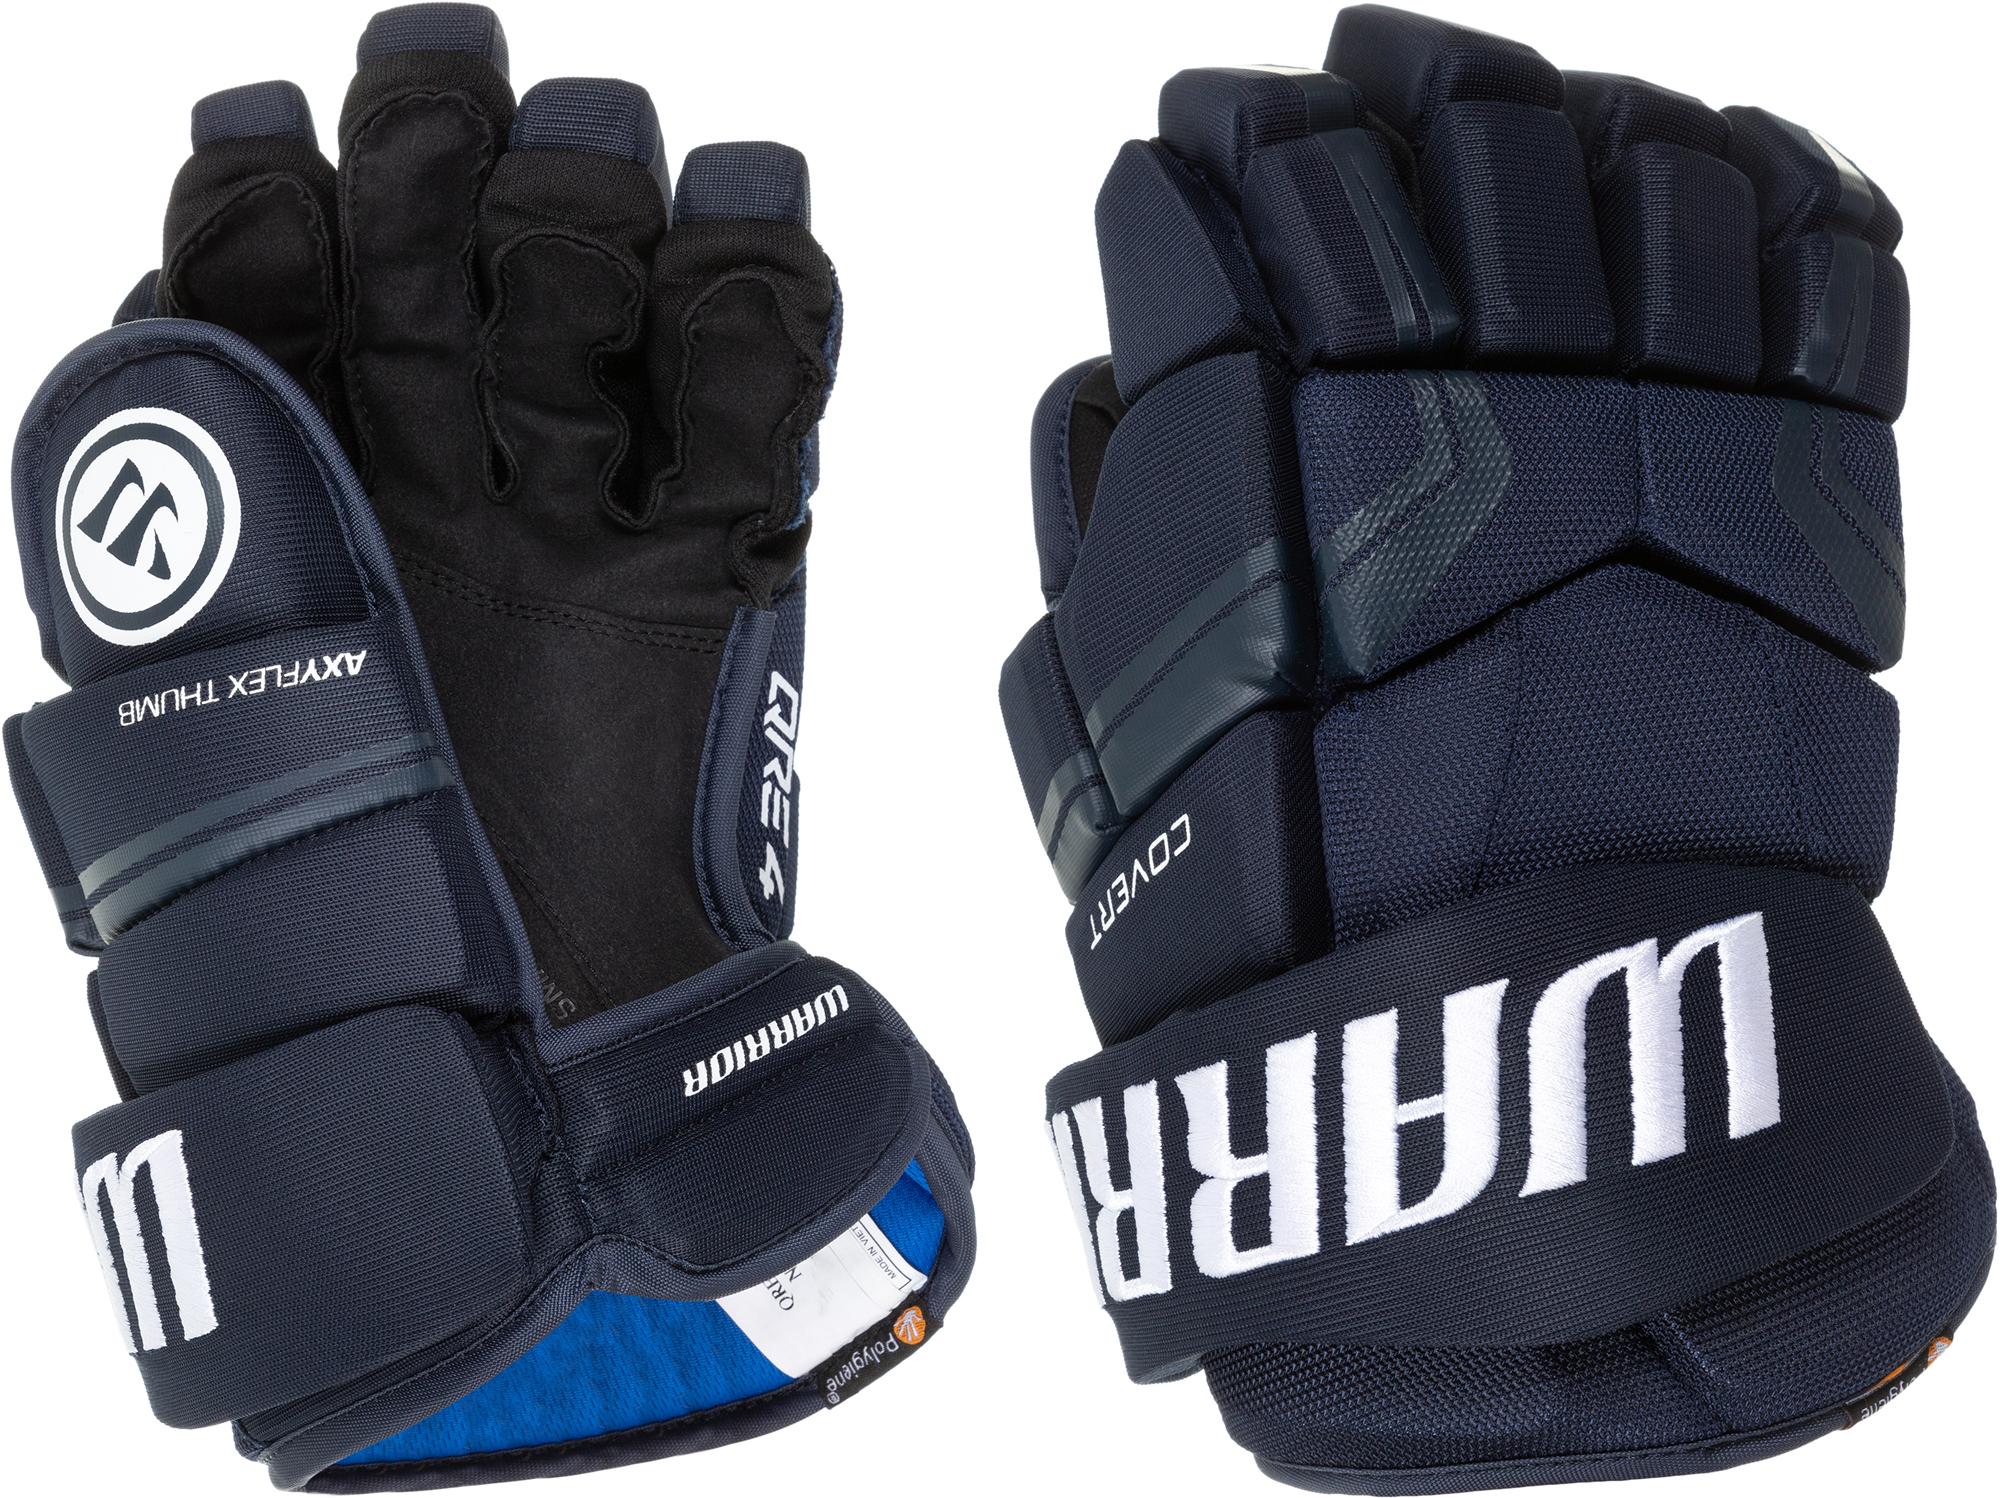 все цены на WARRIOR Перчатки хокккейные WARRIOR Covert QRE4 SR, размер 14 онлайн